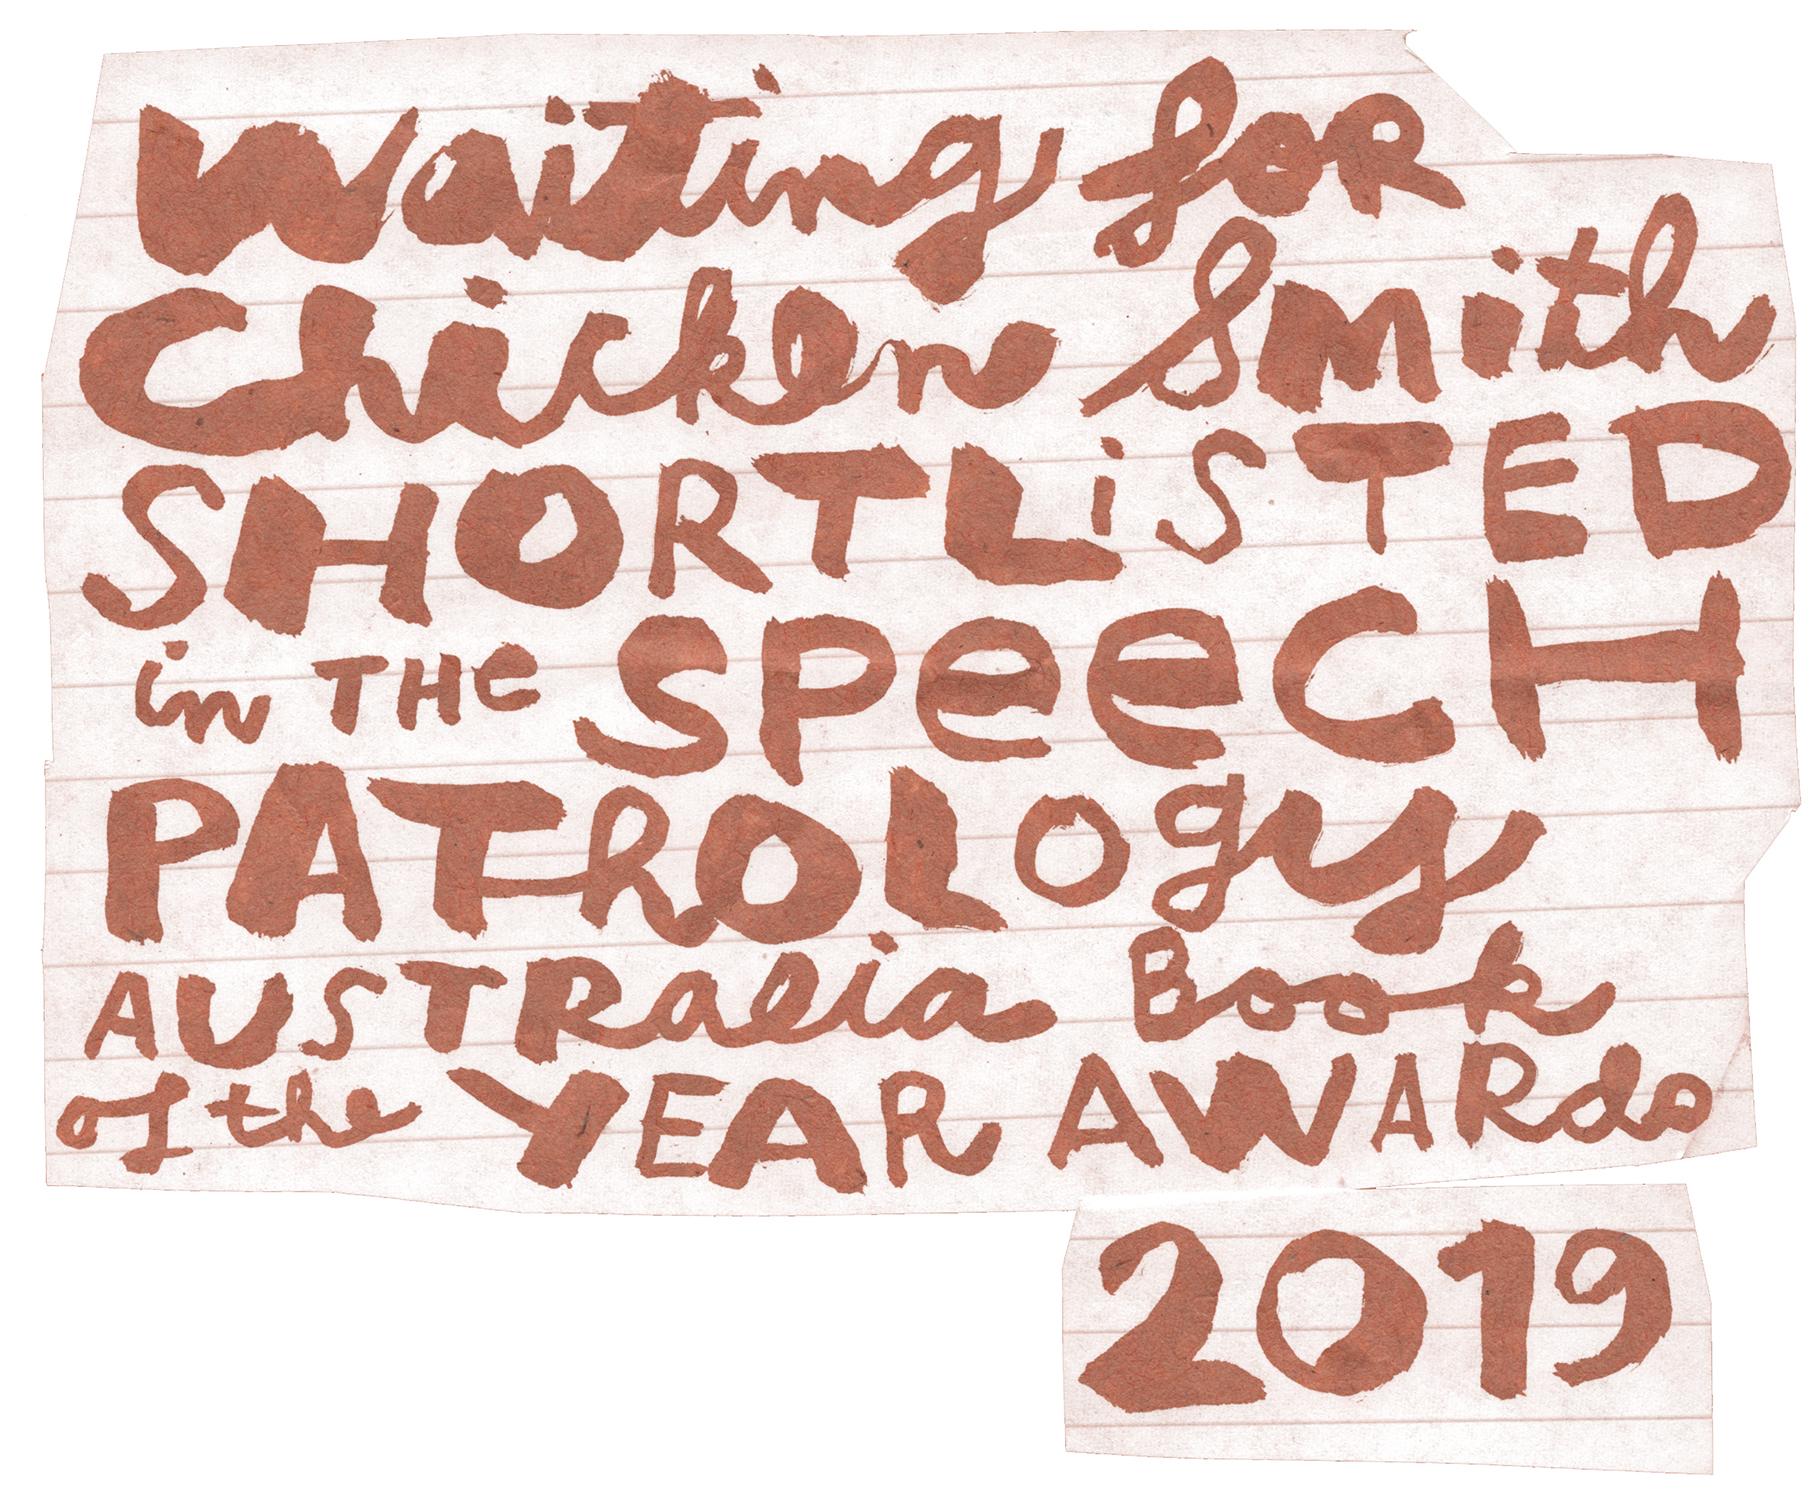 speech pathology australia book awards